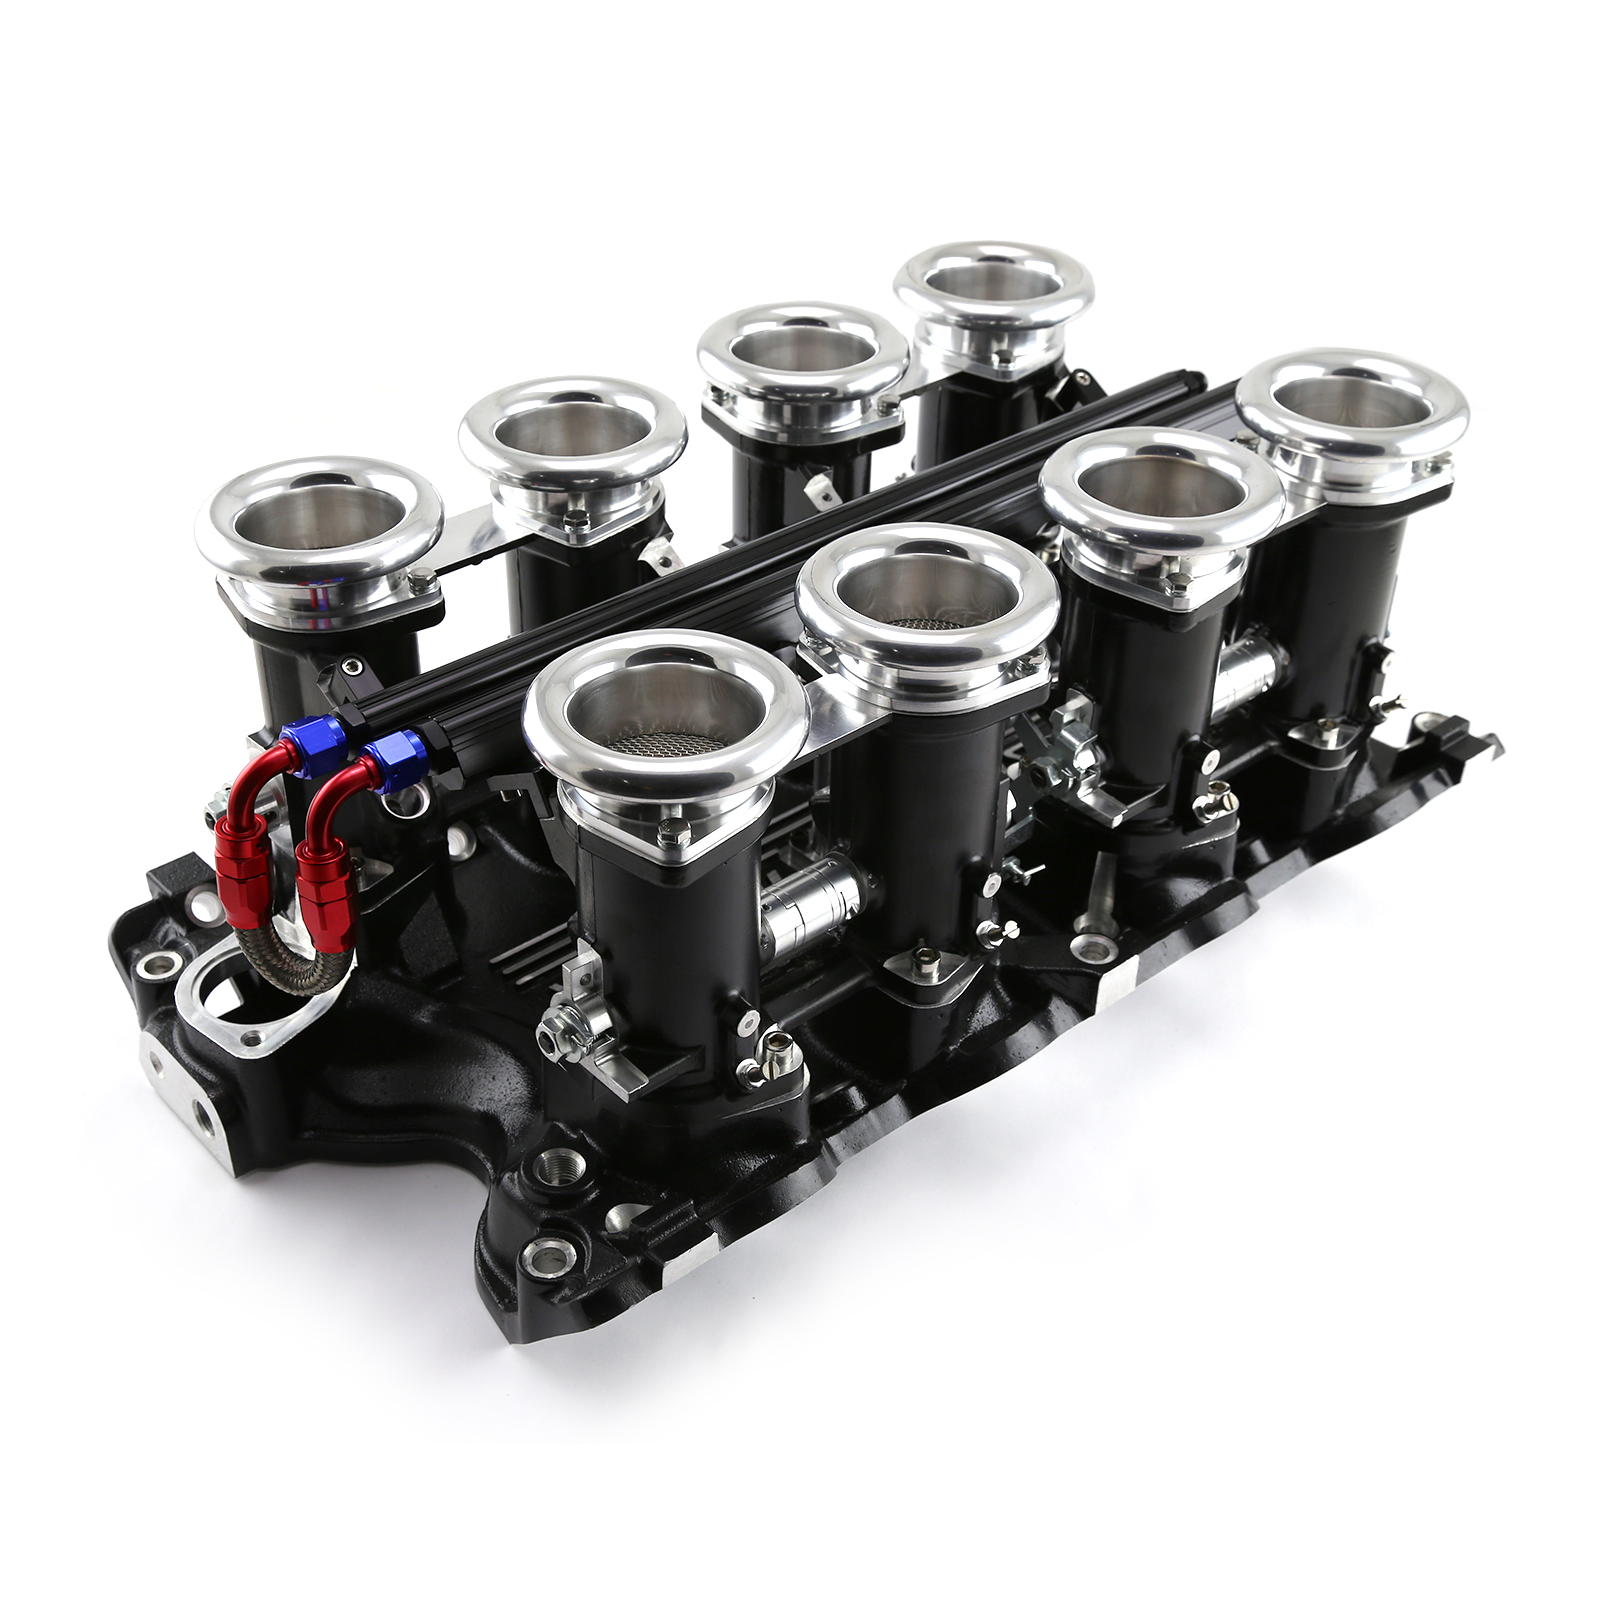 Ford BB 460 Downdraft EFI Stack Intake Manifold System Complete Black